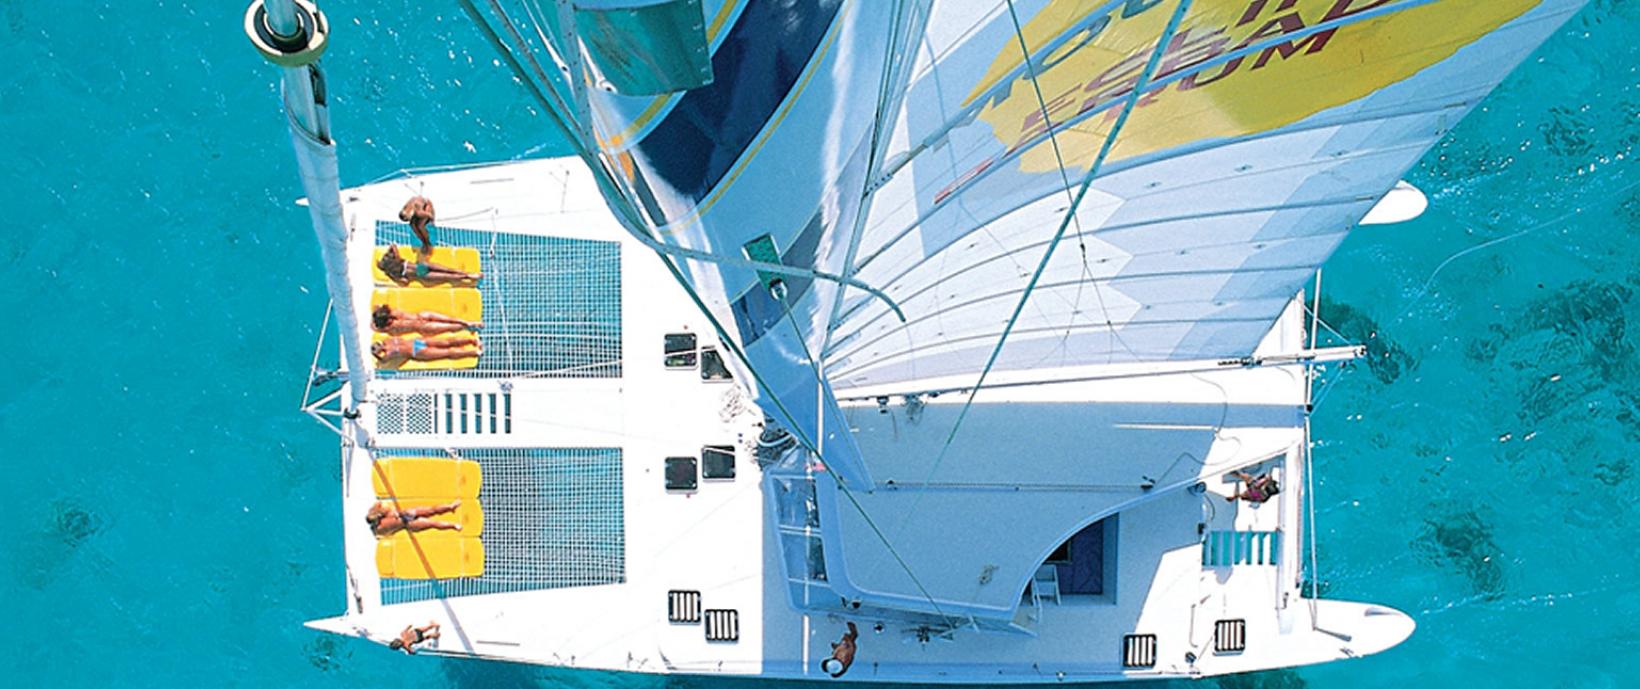 Island Cruise Events